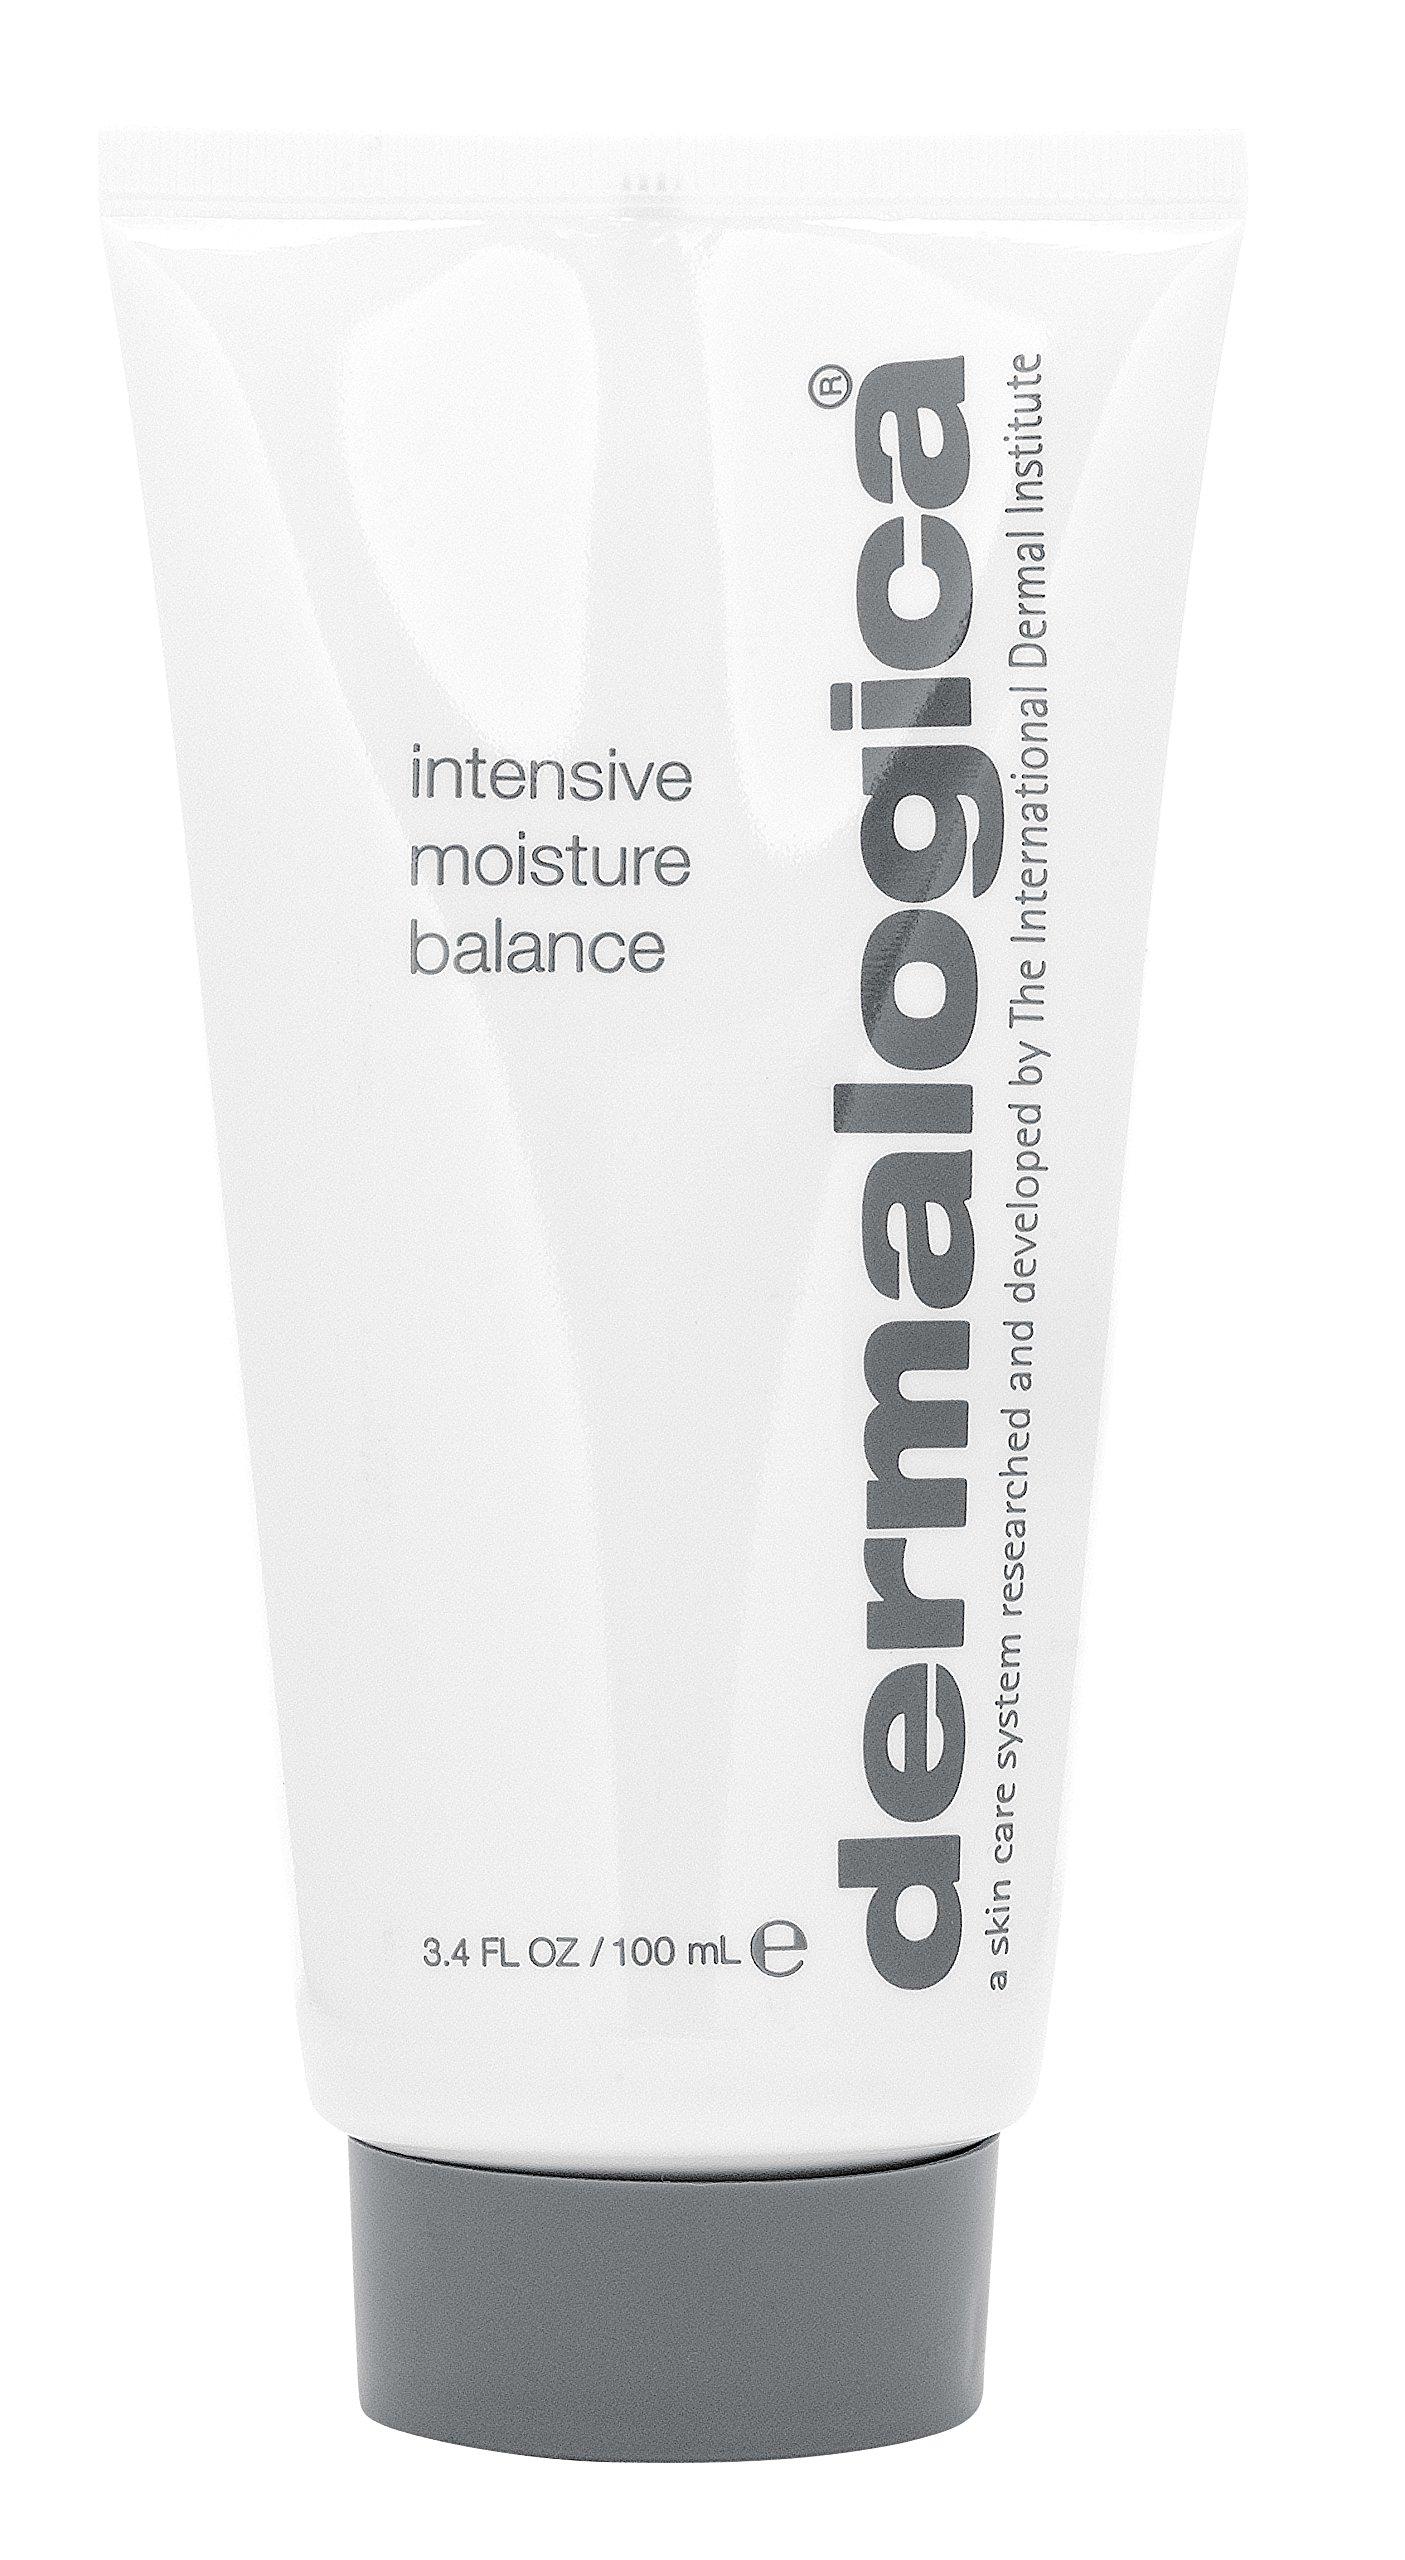 Dermalogica Intensive Moisture Balance, 3.4 oz (100 ml)